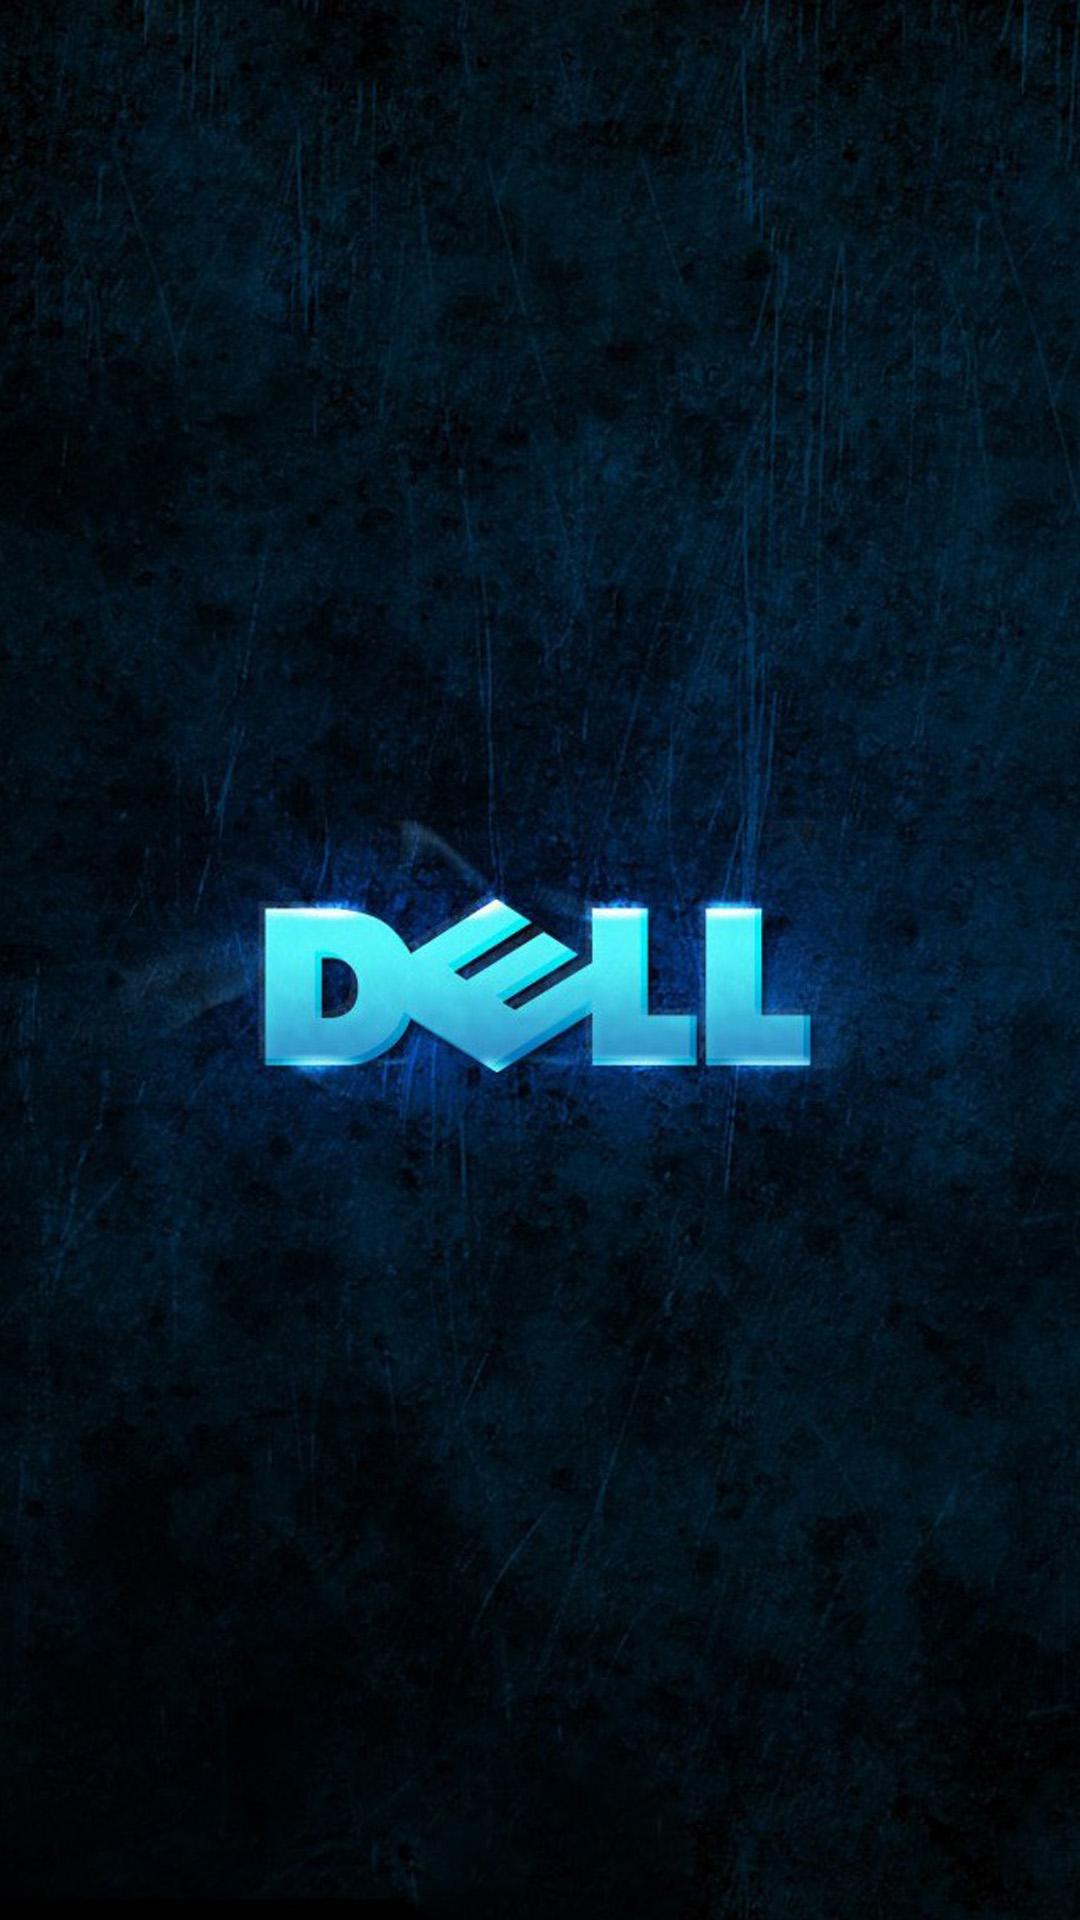 Best Wallpaper Logo Htc - Dell-logo  Pic_751023.jpg